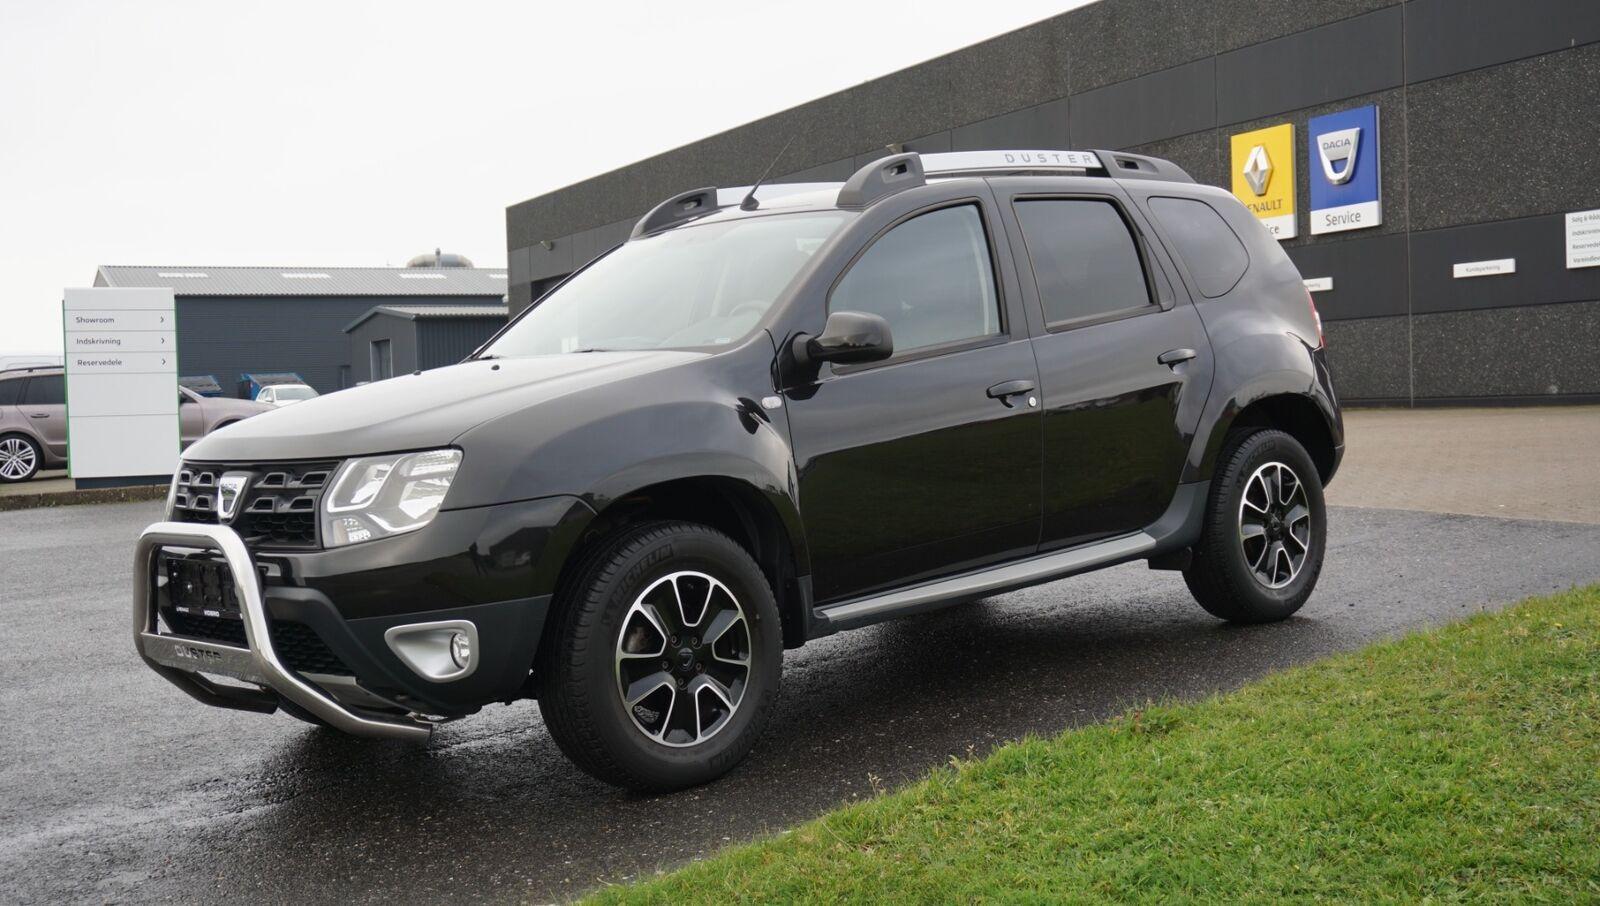 Dacia Duster 1,2 TCe 125 Black Shadow 5d - 139.900 kr.